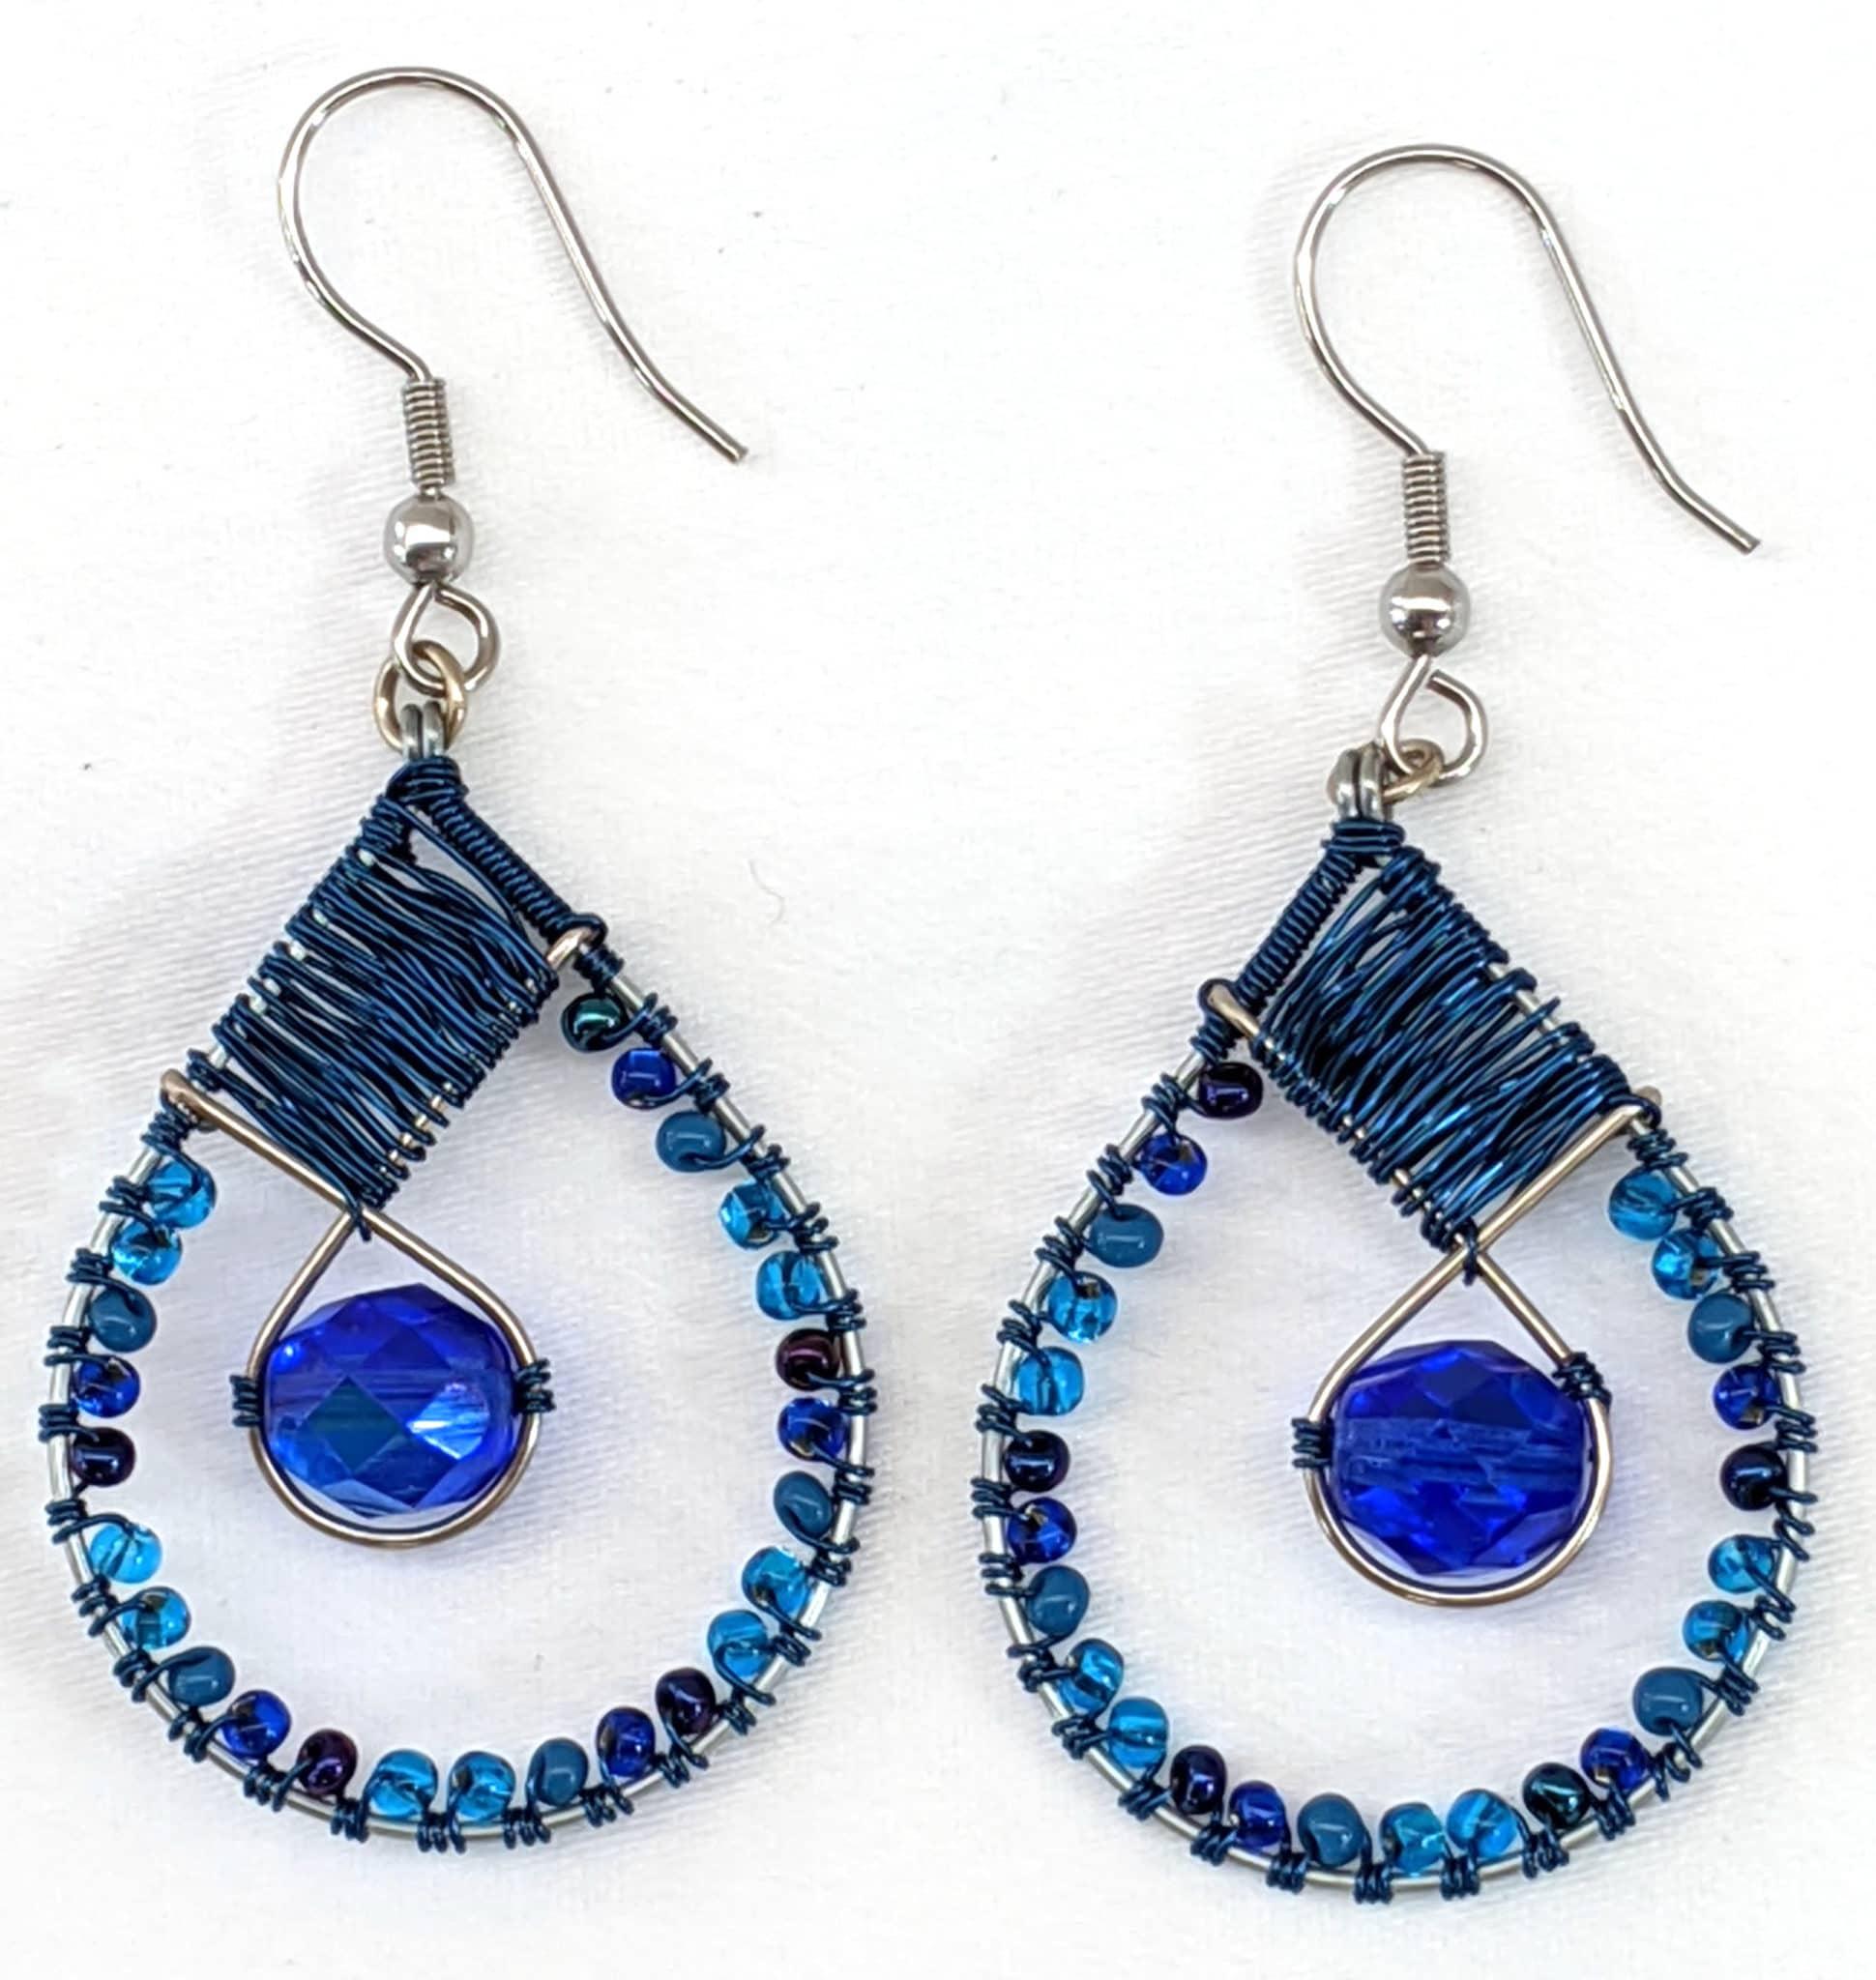 Teardrop with Crystal Beaded Earrings - Blues